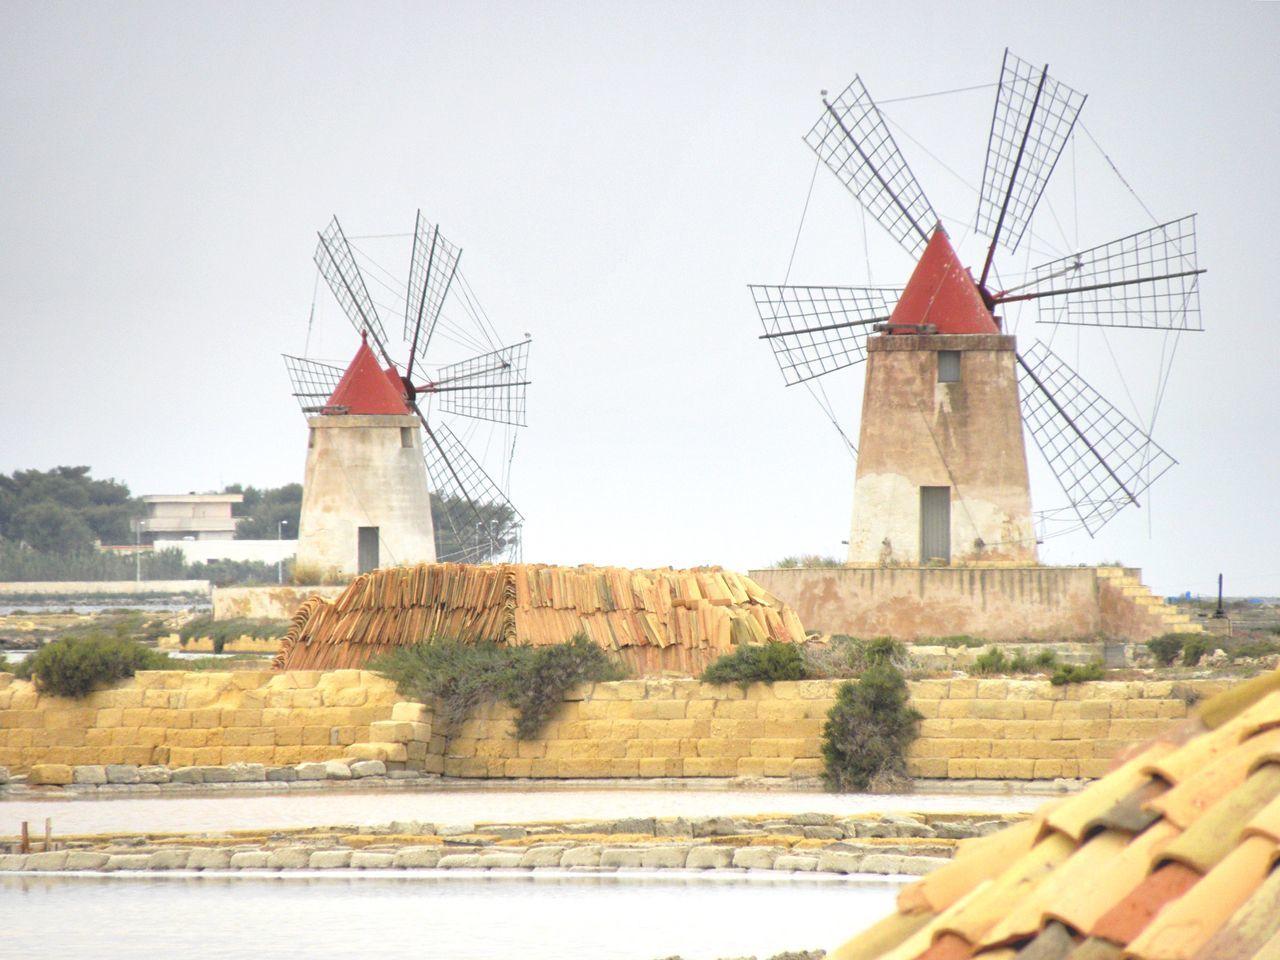 Trapani Salt Flats Salt Flat Salinas Windmill Wind Turbine Traditional Windmill Architecture No People Day Water Clear Sky Red Wind Power Alternative Energy Salt Scenics Sicily Waterfront